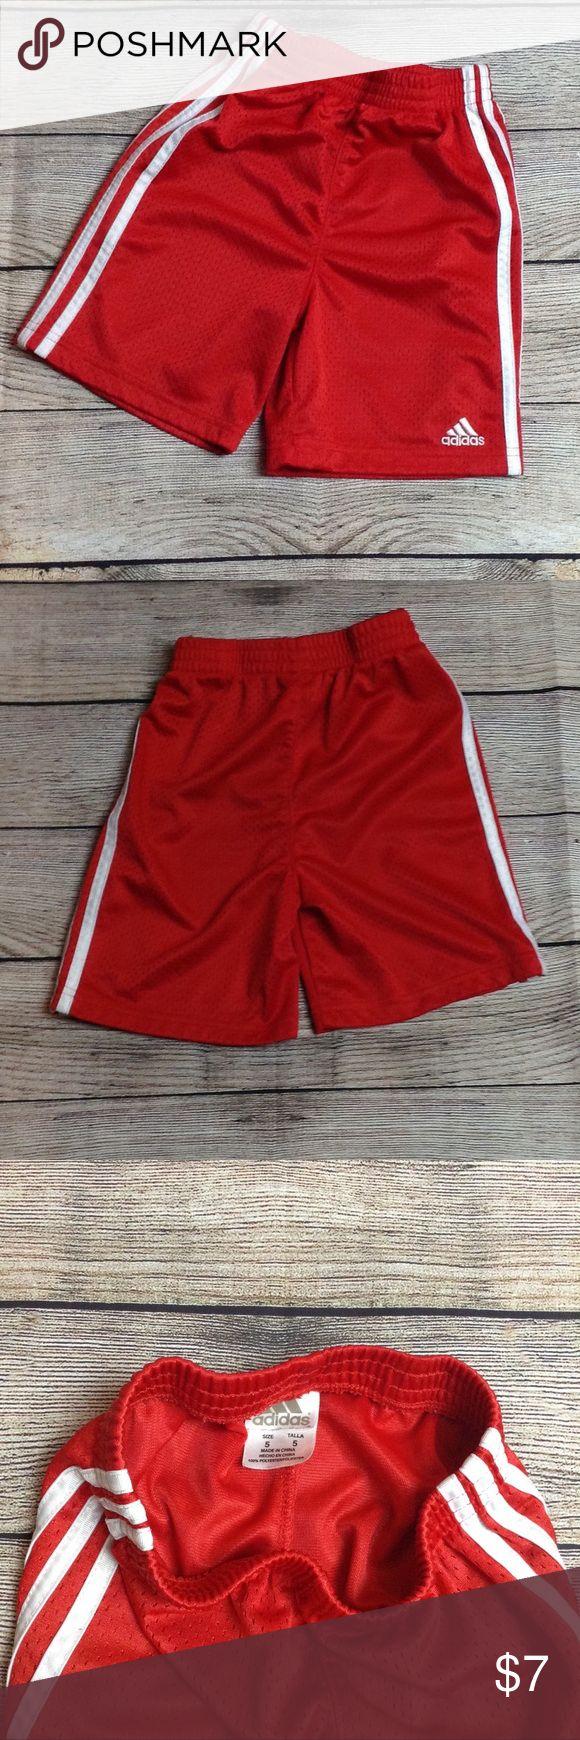 Adidas shorts Adidas boys athletic shorts adidas Bottoms Shorts